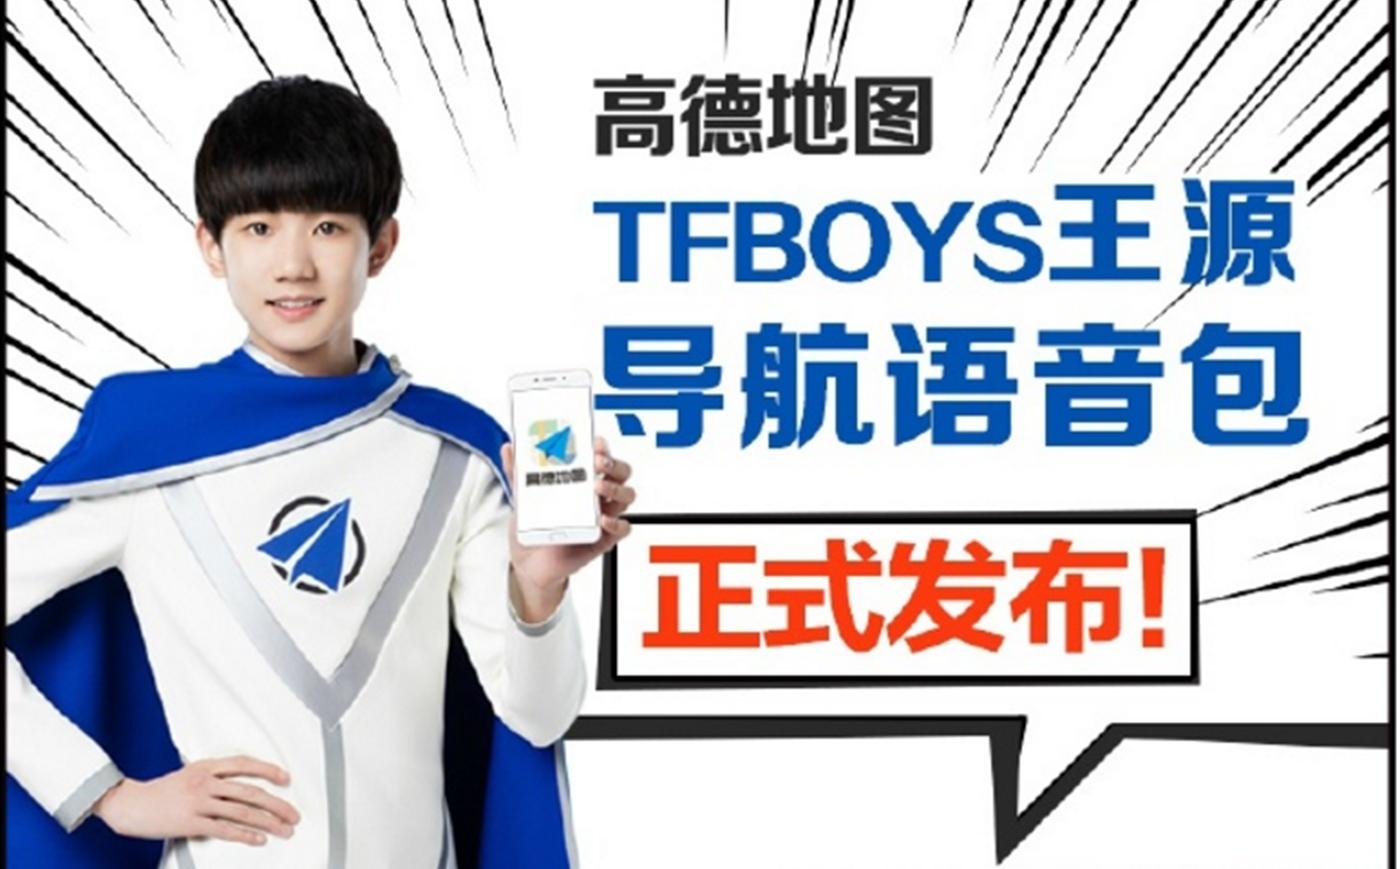 TFBOYS 王源语音包上线 高德声音战略活力升级